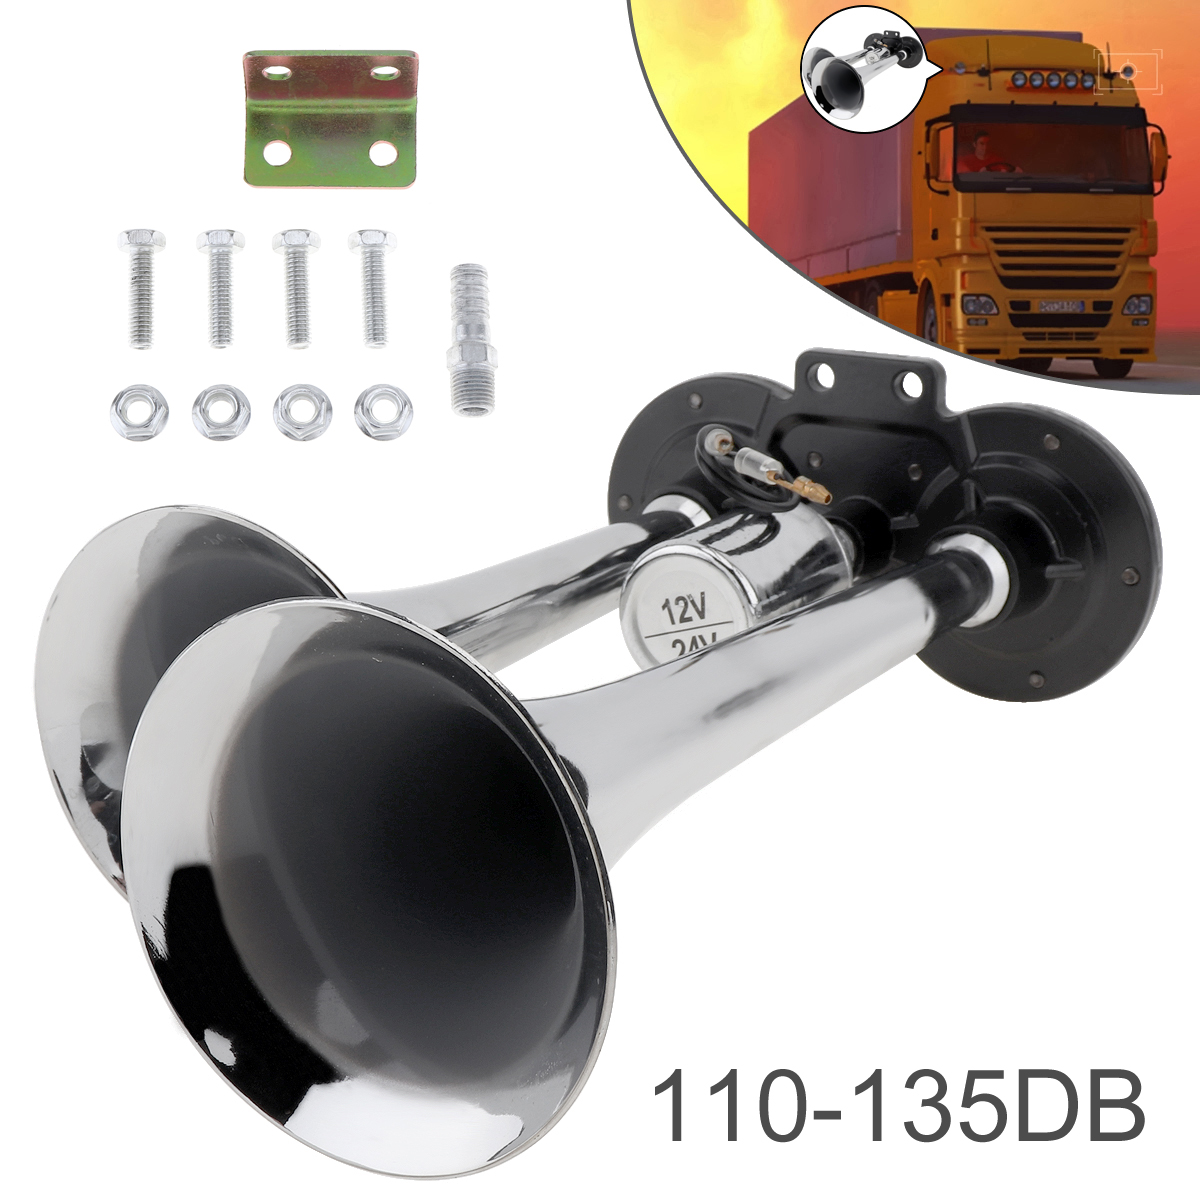 12v 24v 110 135db Super Loud Car Air Horn Heavy Duty Dual Trumpet Train Two Tone Auto Set